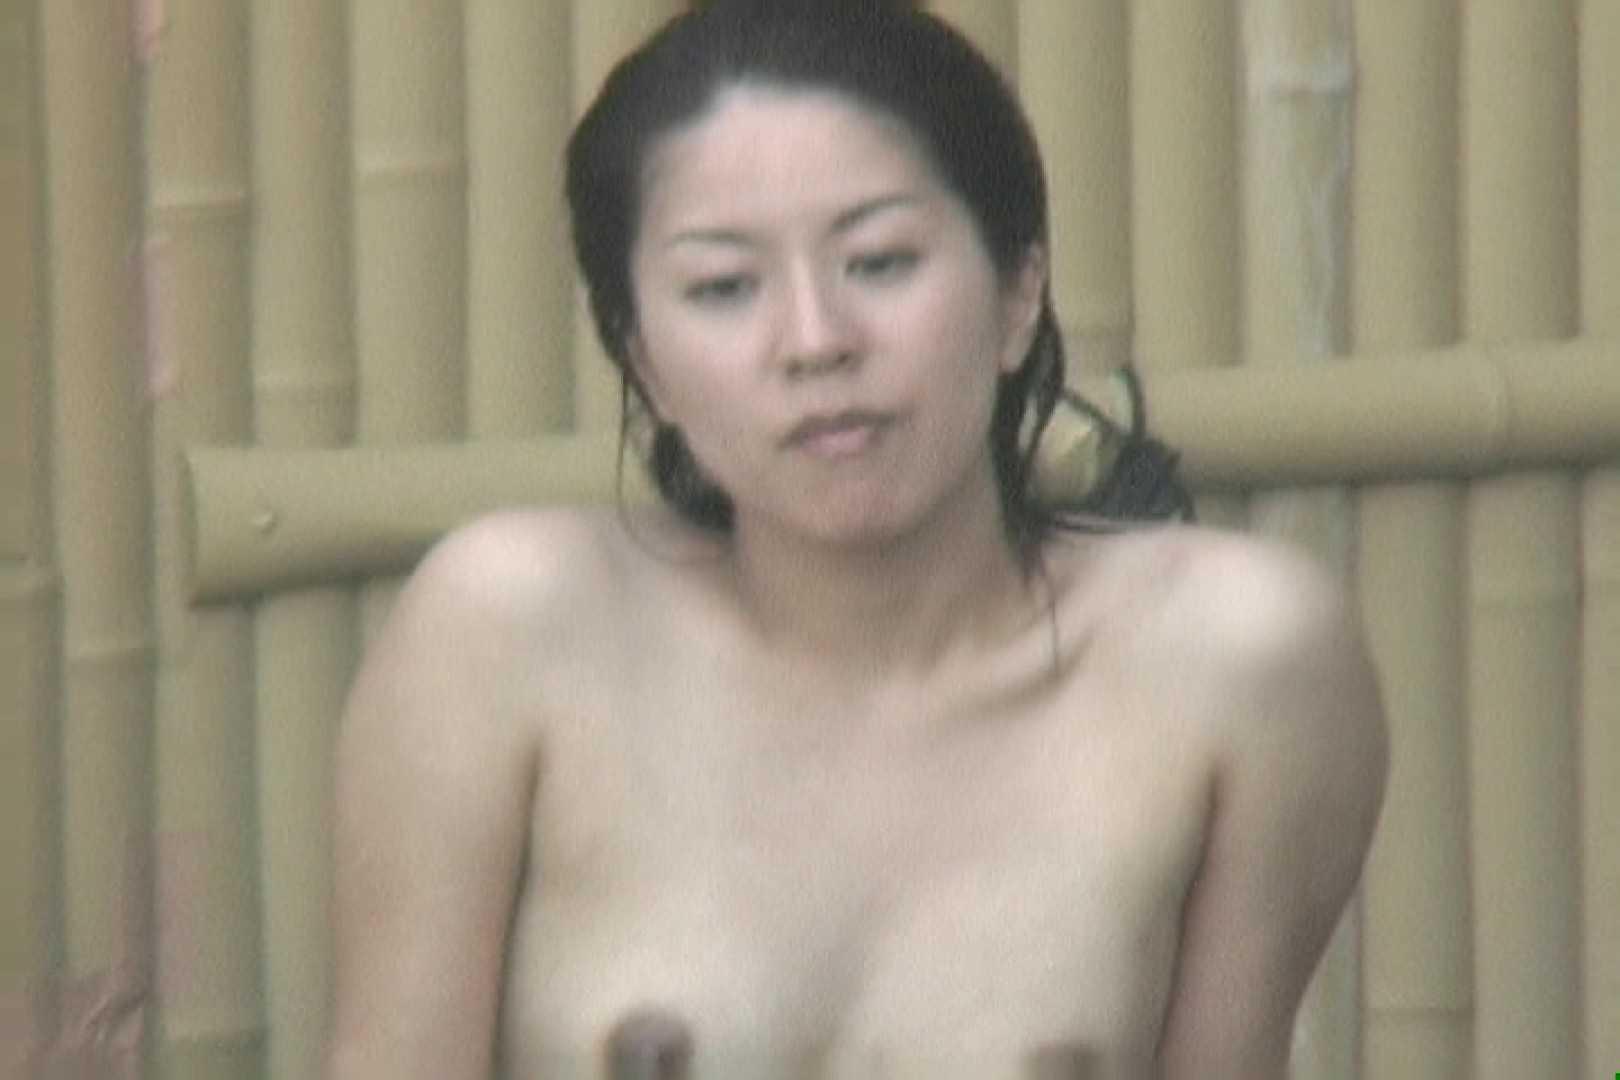 Aquaな露天風呂Vol.694 露天 オメコ無修正動画無料 110PICs 77